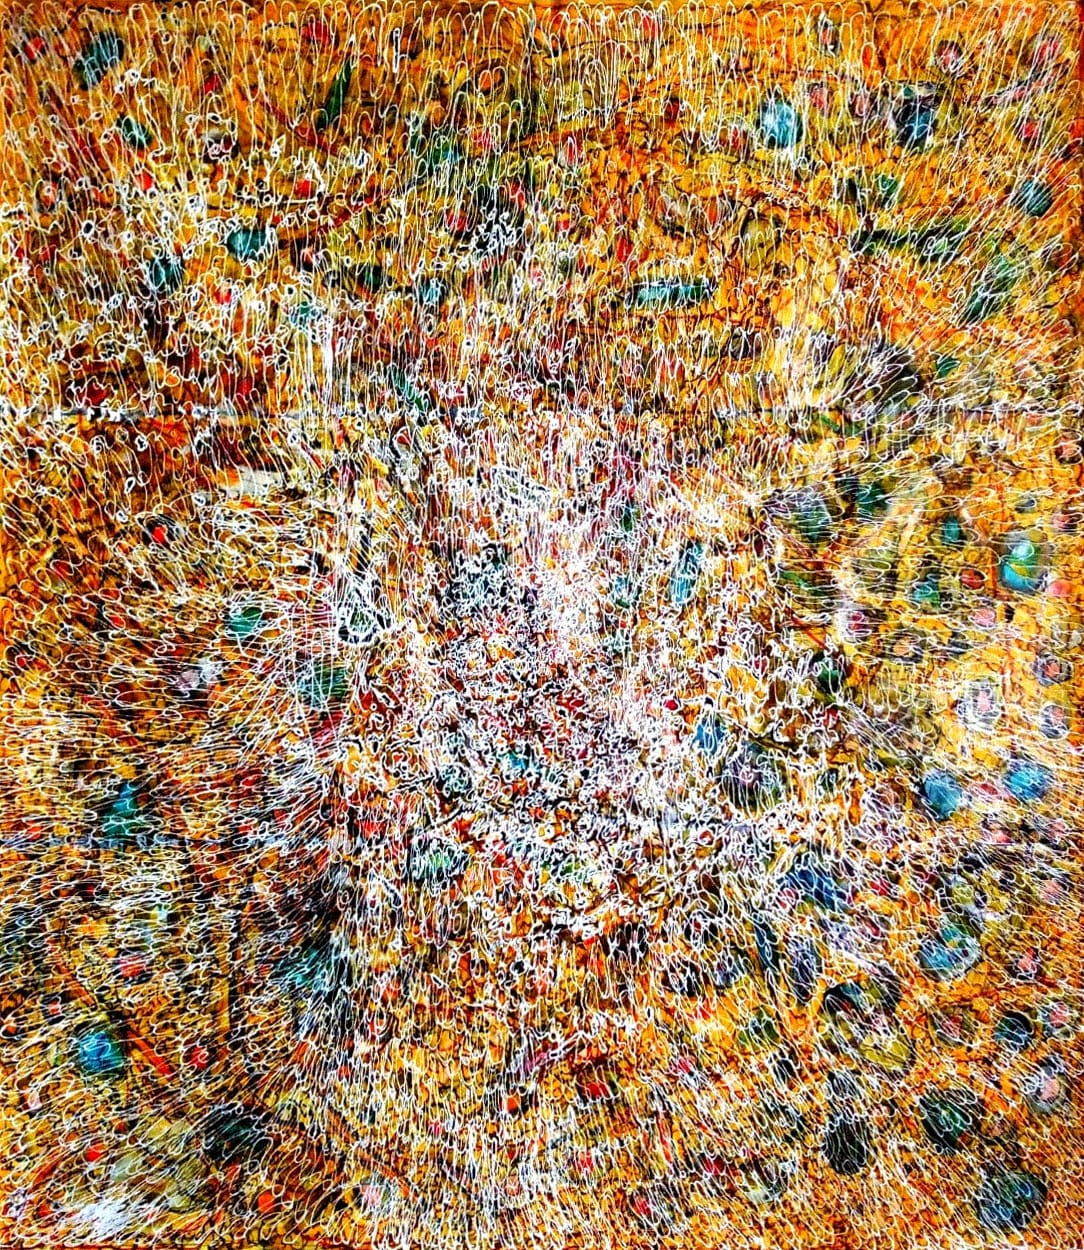 Hyacinthe Ouattara, Density, Rhythm and Frequencies VII, 2020